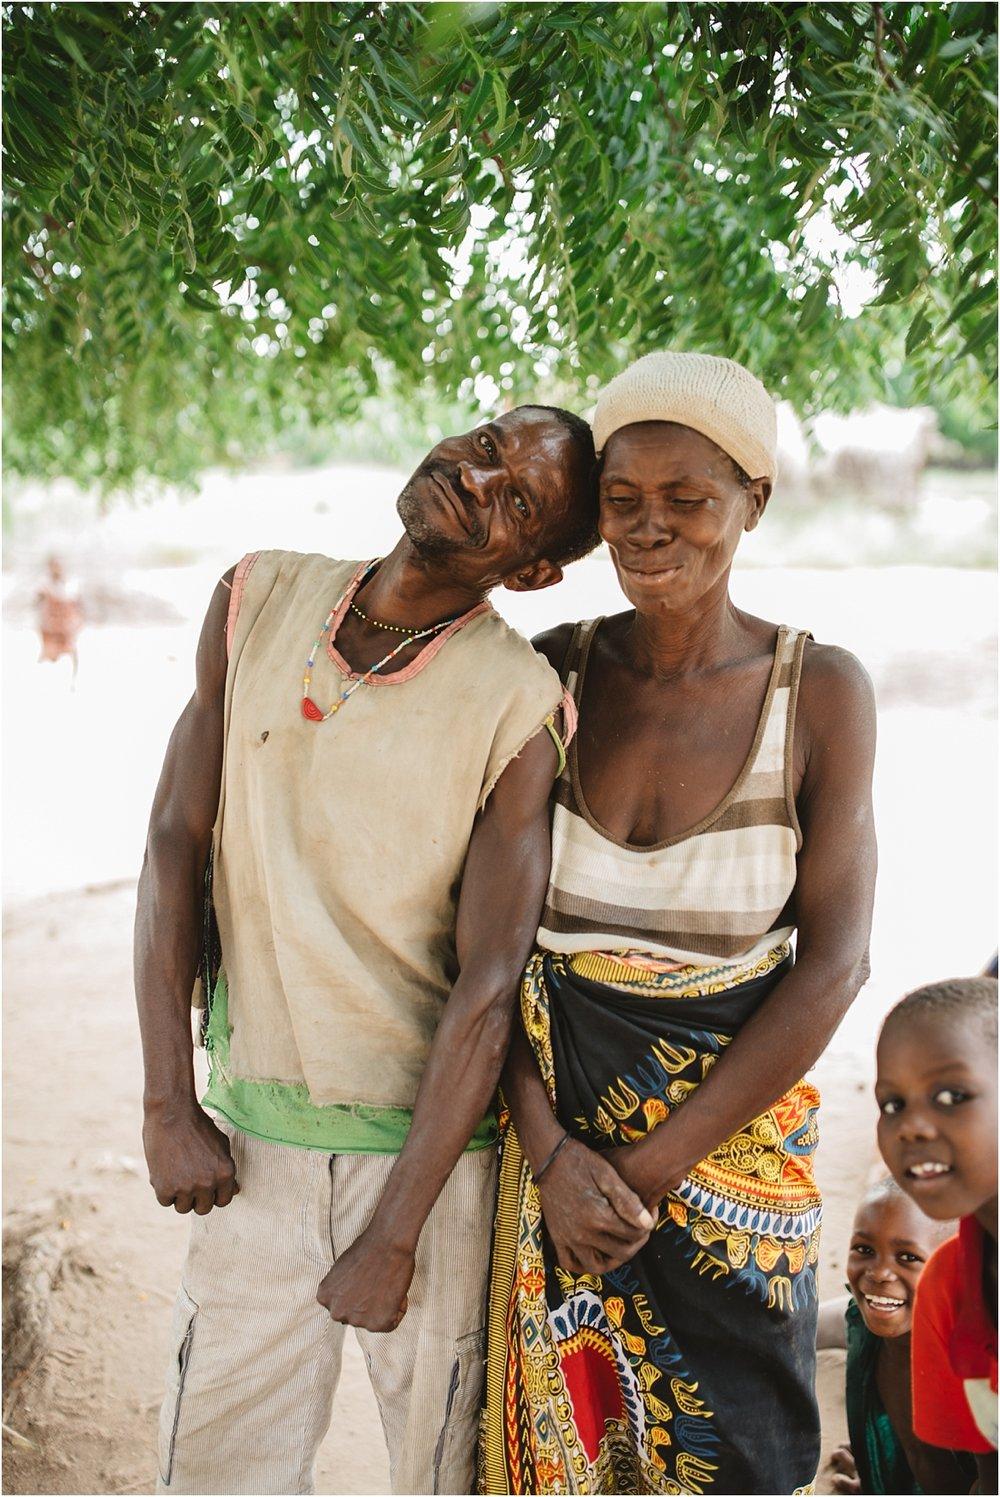 malawi_tearfund_humanitarian_0041.jpg